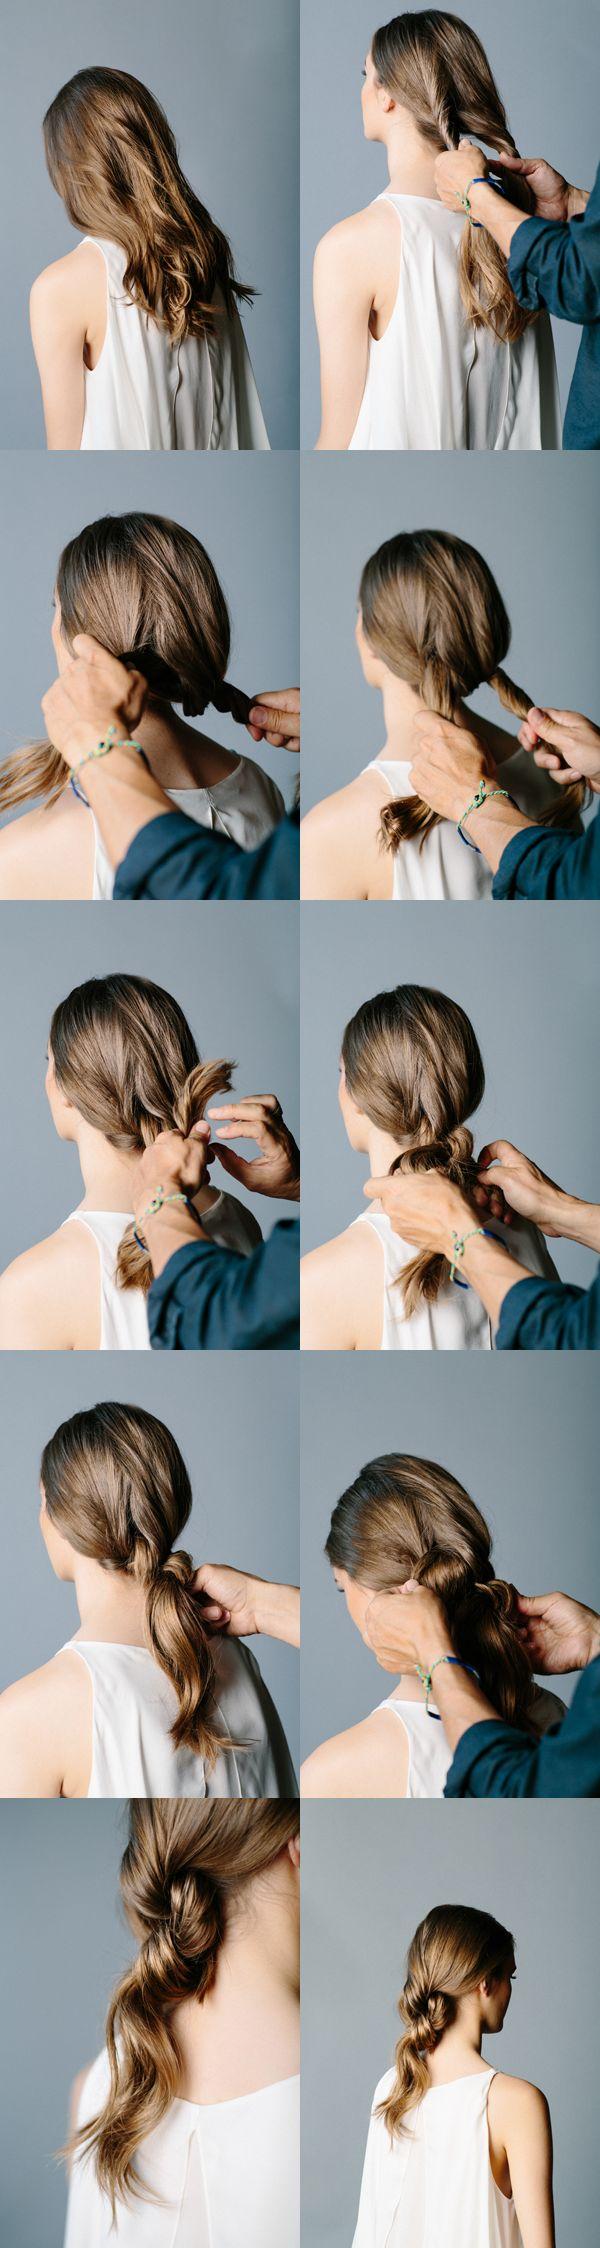 DIY Double Knot Ponytail - #diyhair #diyhairtutorial #diyweddinghair